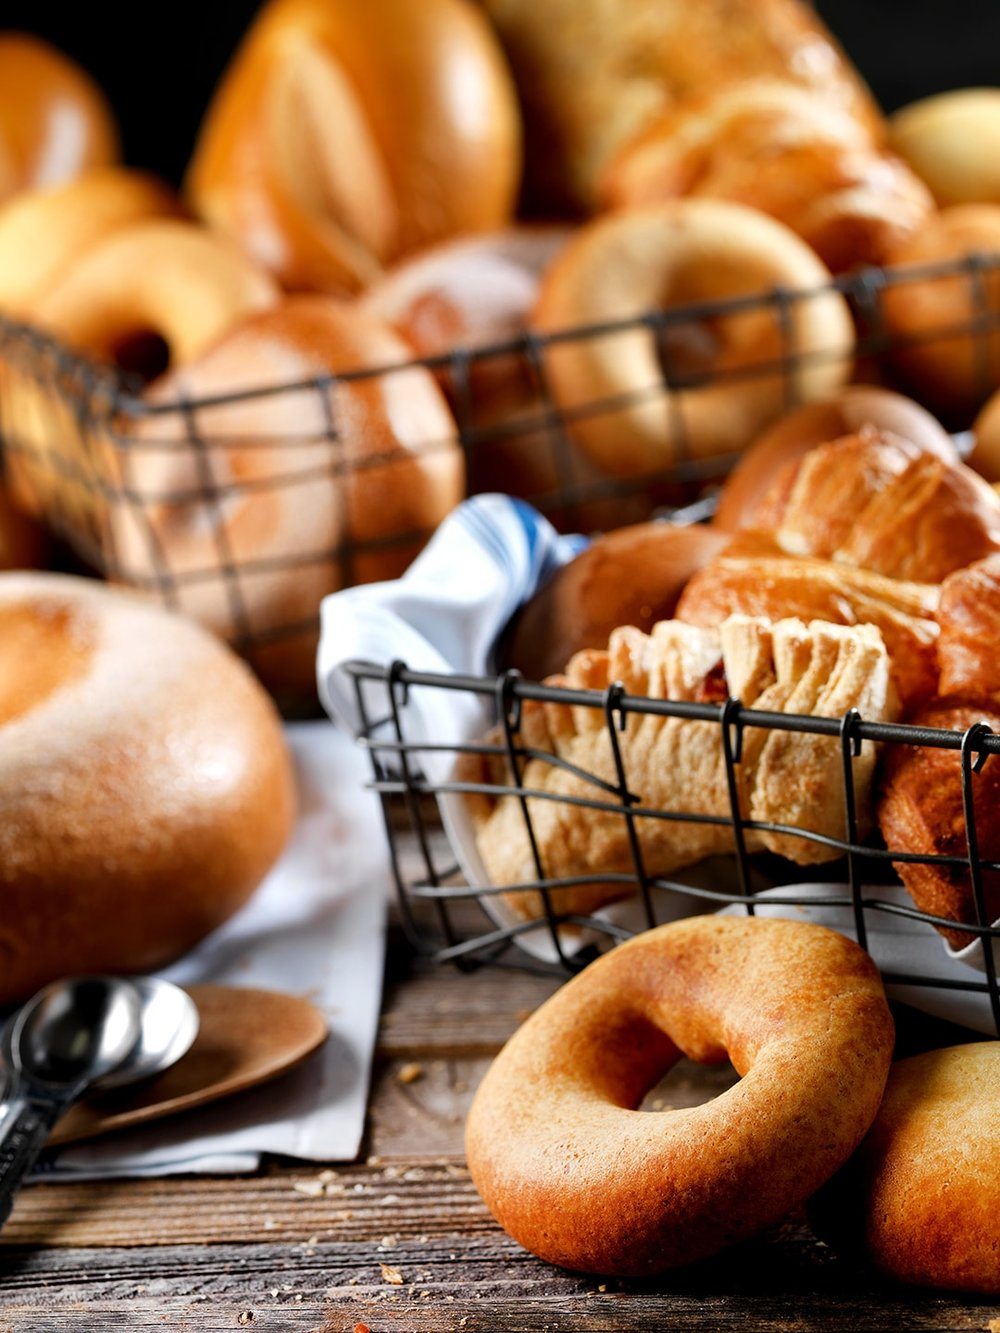 bakery-food-photography-miami-marcel-boldu.jpg